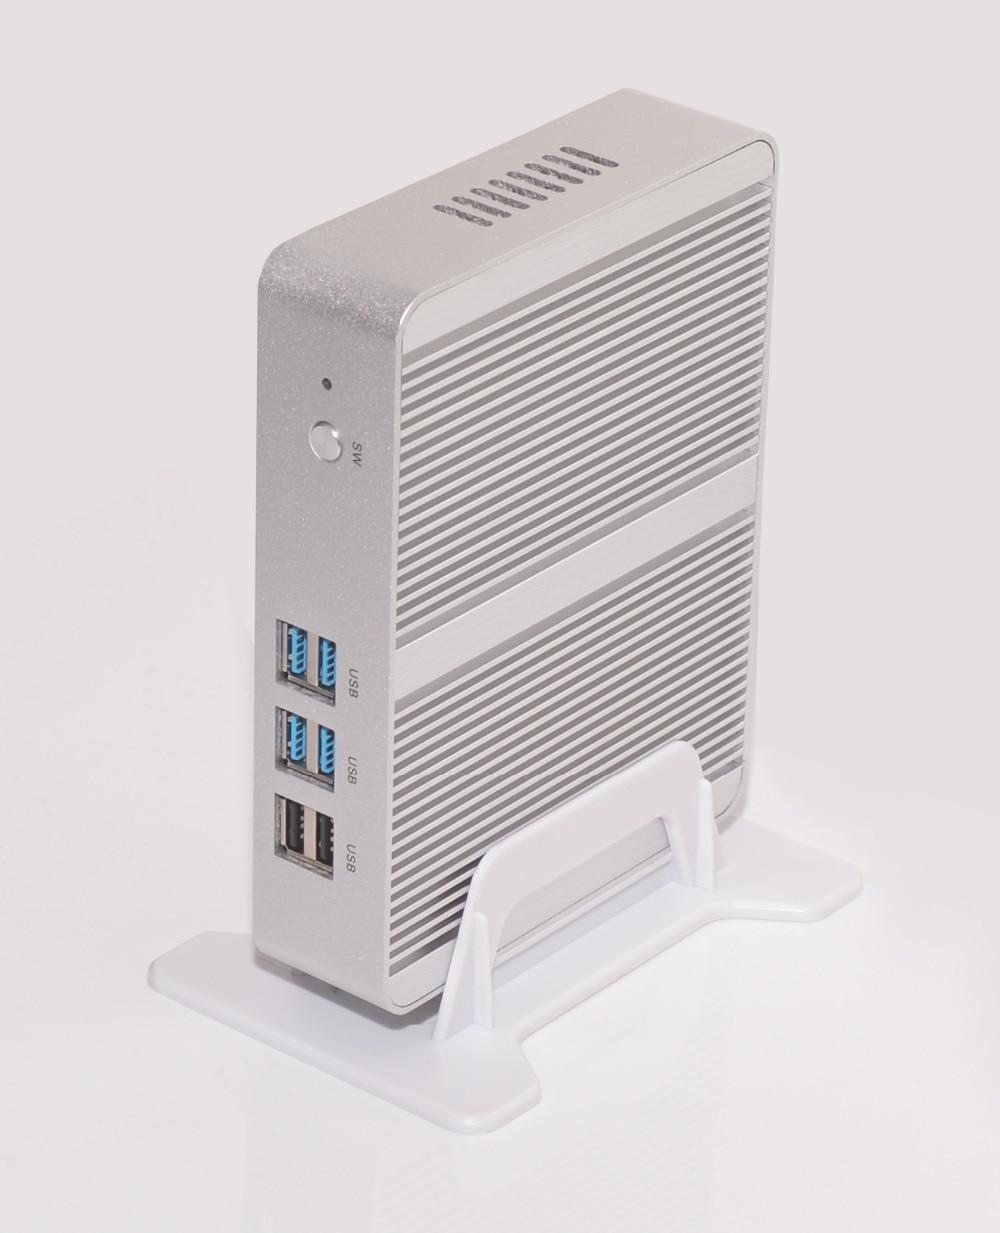 Promotion Cheap Fanless Core I3 Mini PC M325/M330  Core I3 4005U 5005U Dual Display,Low Power Silver Small Computer